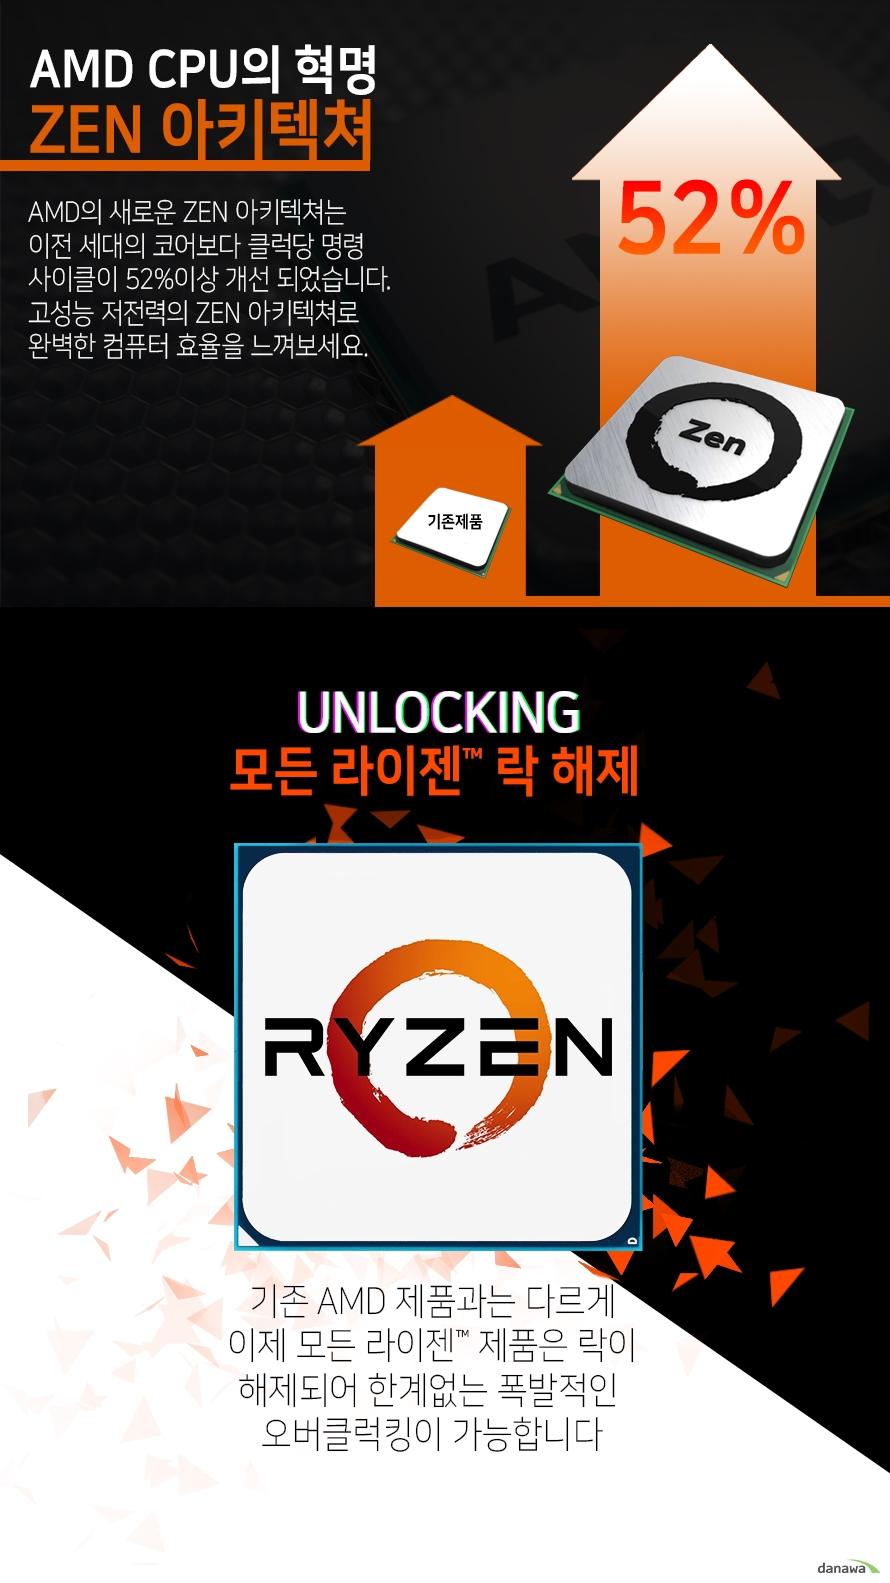 ZEN 아키텍쳐                    AMD의 새로운 ZEN 아키텍쳐는 이전 세대의 코어보다           클럭당 명령 사이클이 52%이상 개선 되었습니다.          고성능 저전력 ZEN 아키텍쳐로 완벽한 컴퓨터 효율을 느껴보세요.                              UNLOCKING          모든 라이젠 락 해제          기존 AMD 제품과는 다르게 이제 모든 라이젠 제품은          락이 해제되어 한계없는 폭발적인 오버클럭킹이 가능합니다.